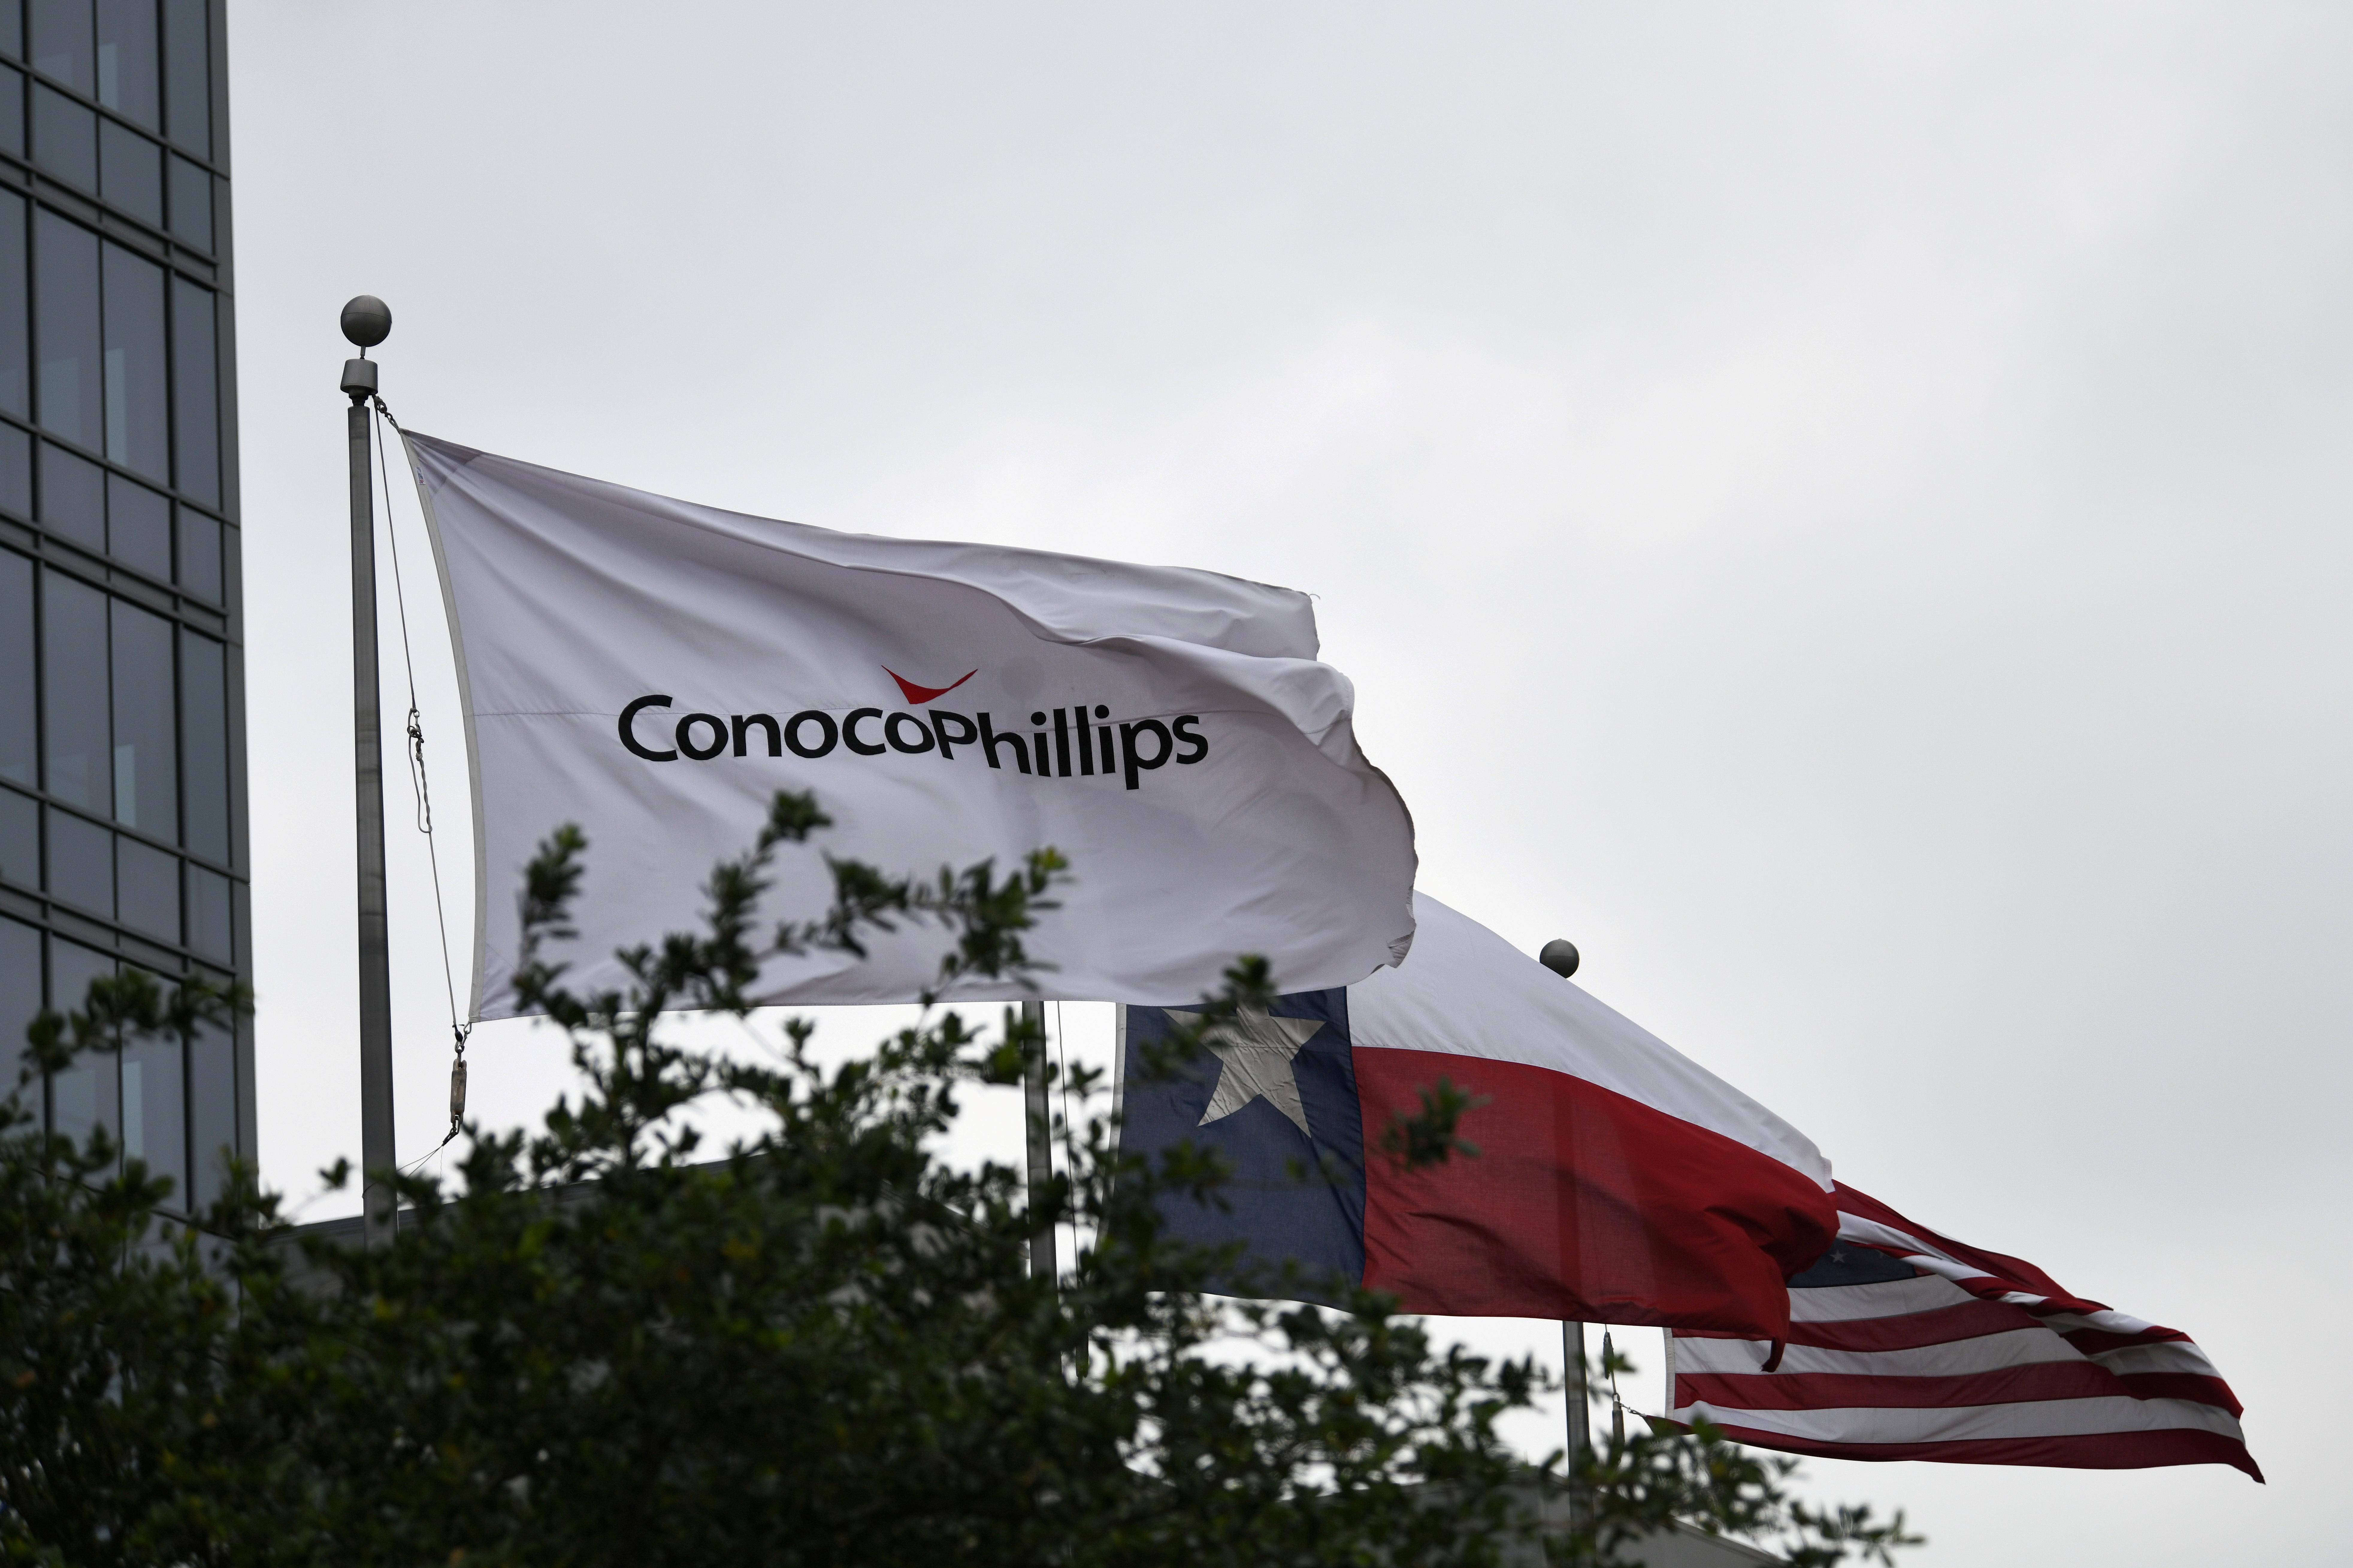 Flags fly outside ConocoPhillips offices in Houston, Texas, U.S., April 30, 2019.  REUTERS/Loren Elliott